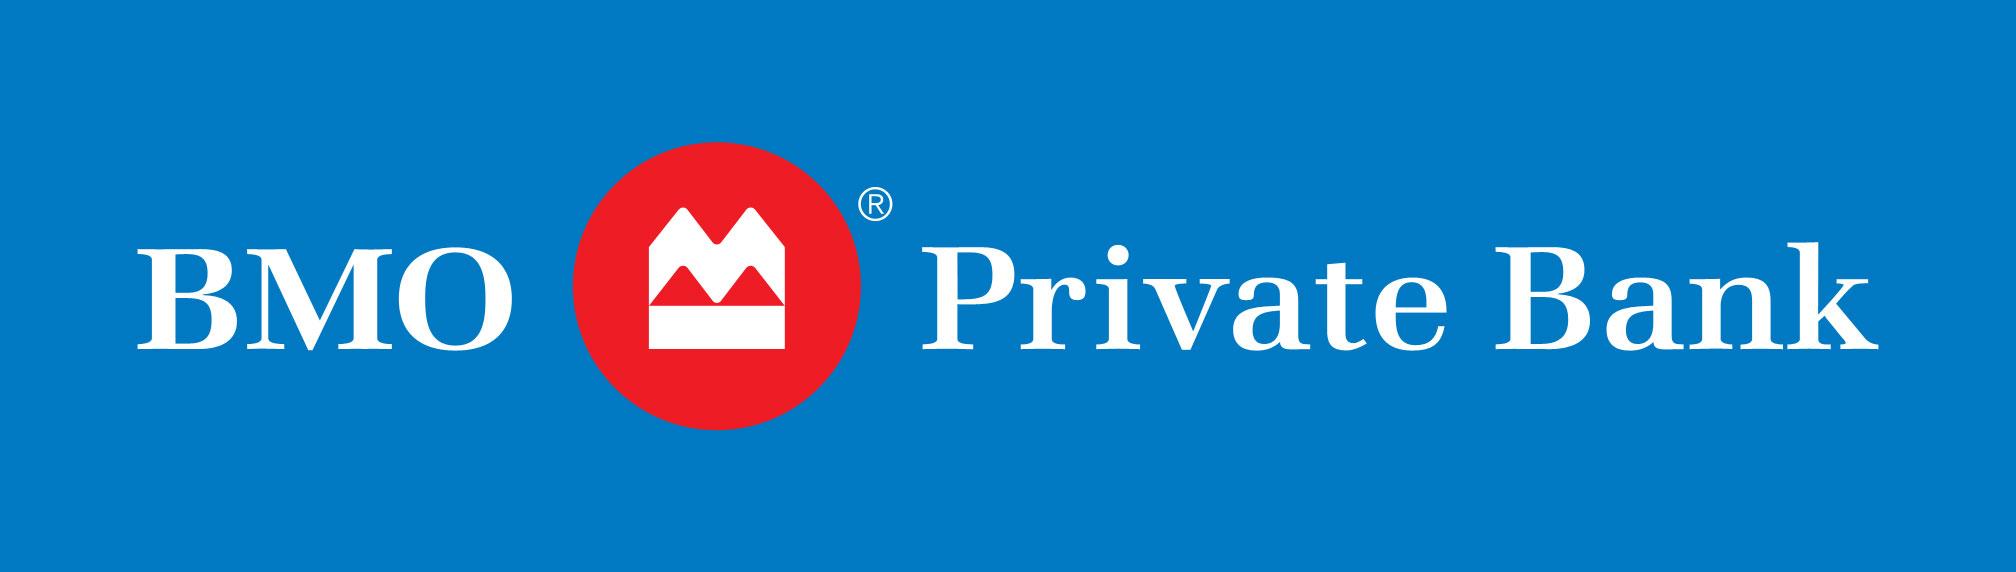 BMO Private Bank Logo